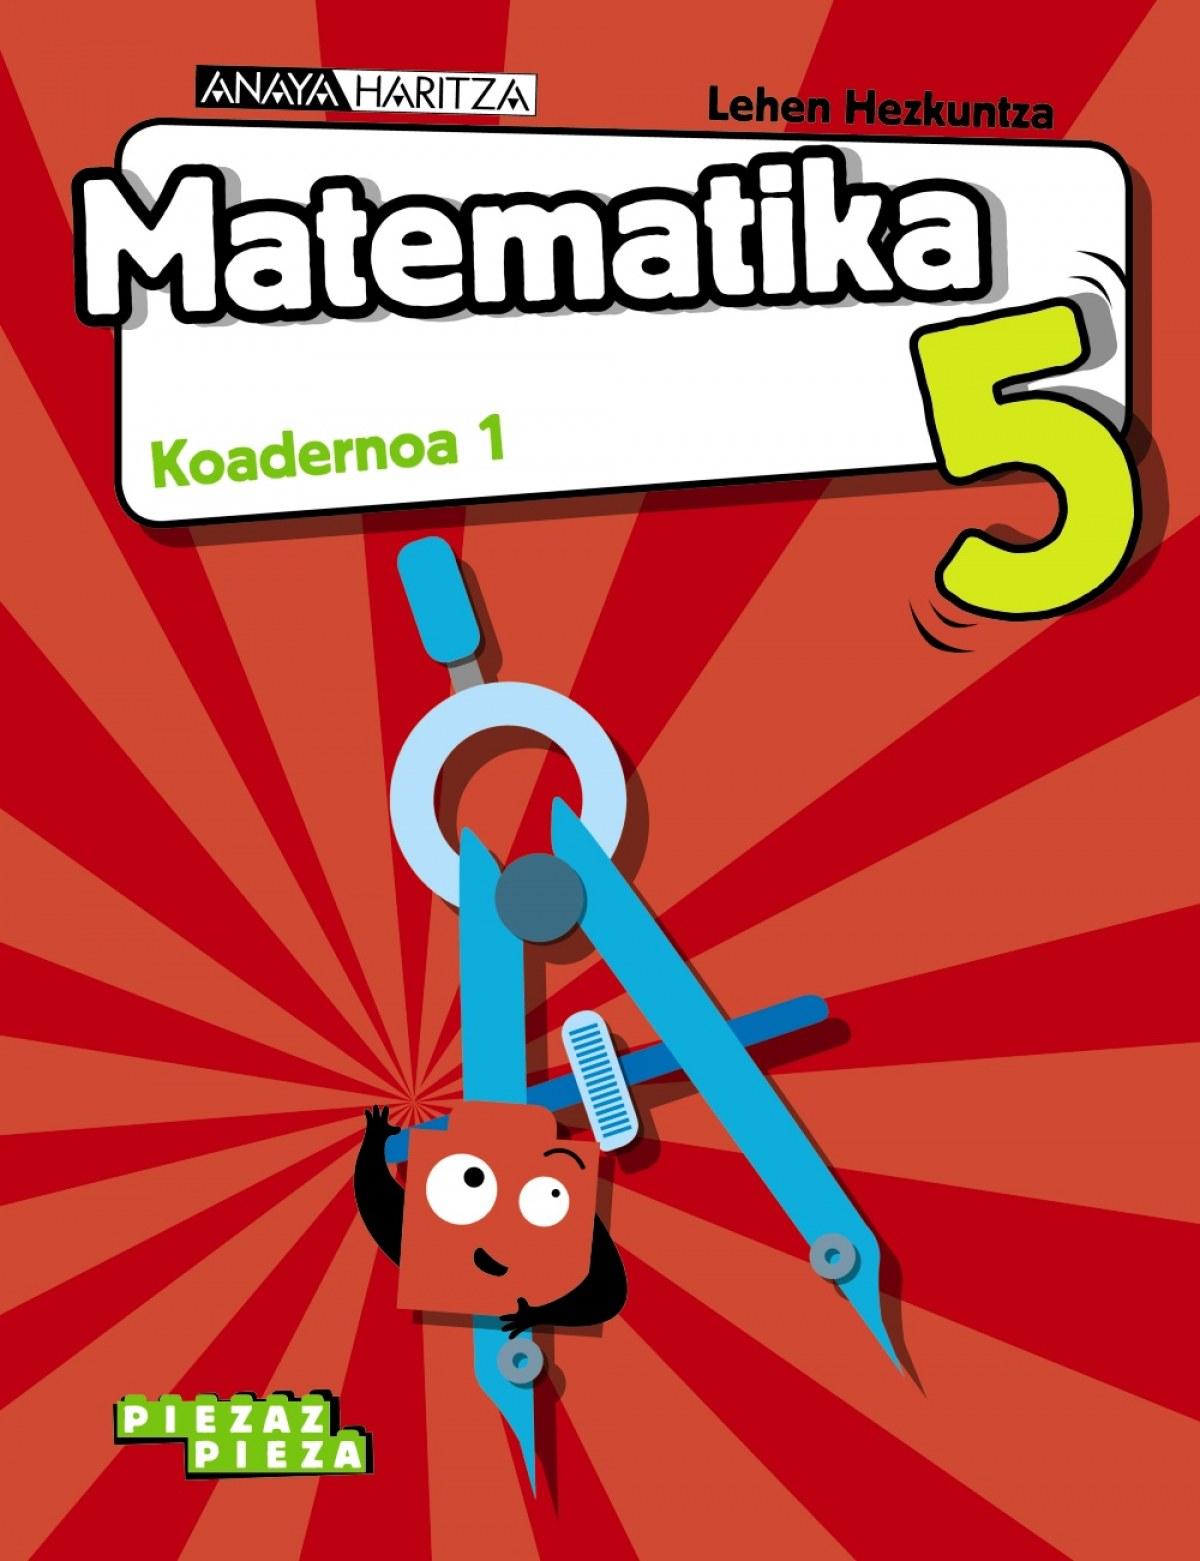 Matematika 5. Koadernoa 1.